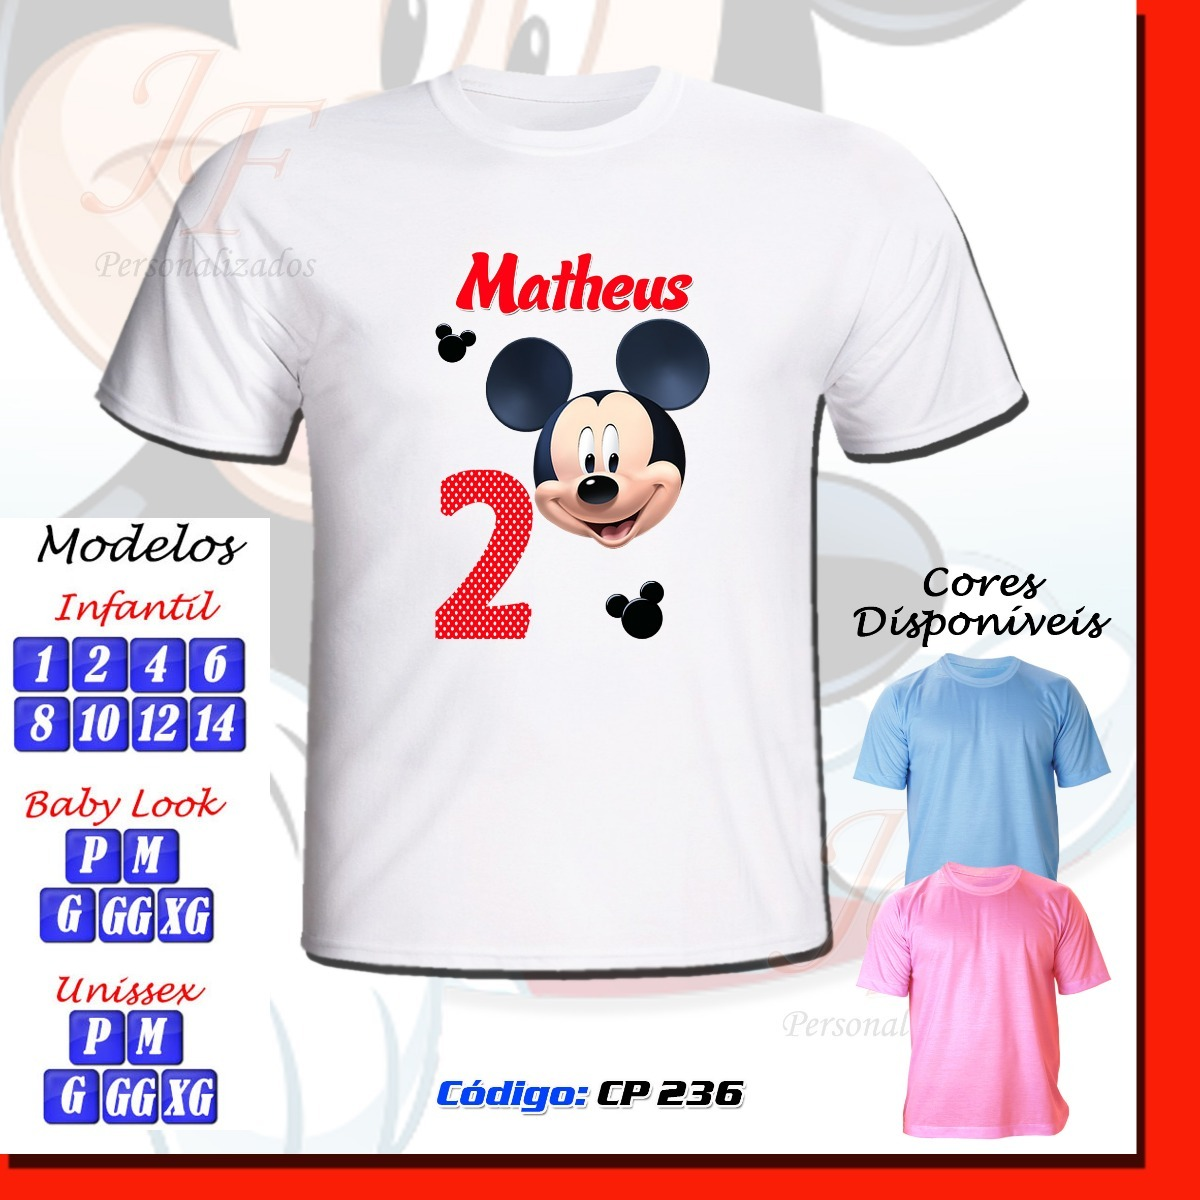 f7520679c 01 camiseta adulto infantil personalizada mickey mouse. Carregando zoom.